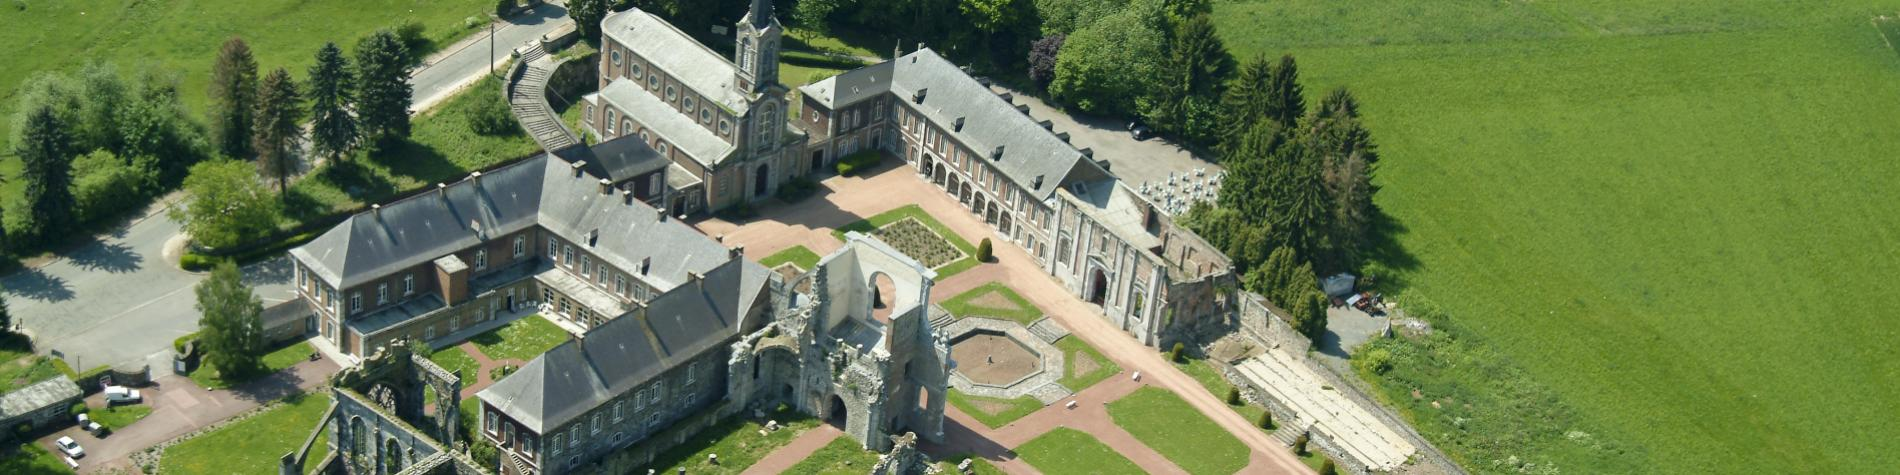 Abbaye d'Aulne - Gozée - moines cisterciens